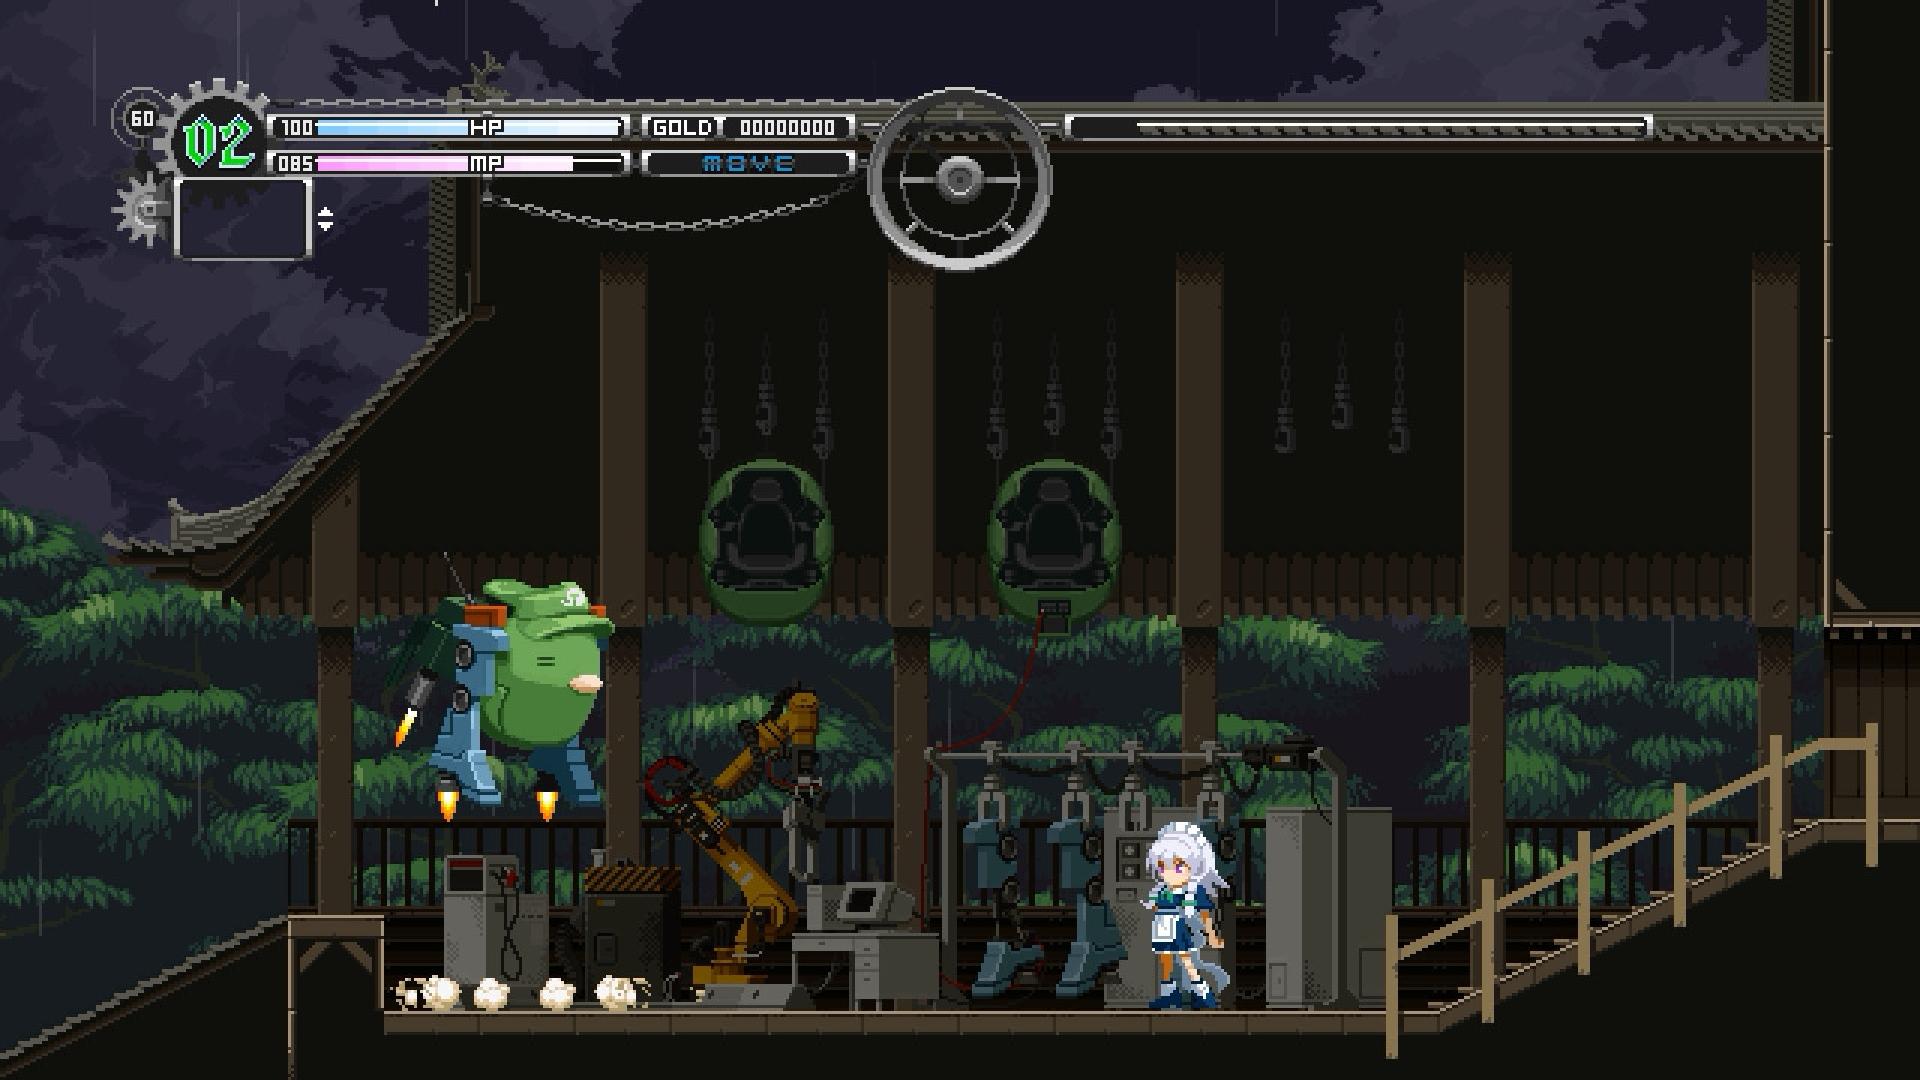 Touhou Luna Nights puts a stylish Metroidvania twist on the shmup mega-series